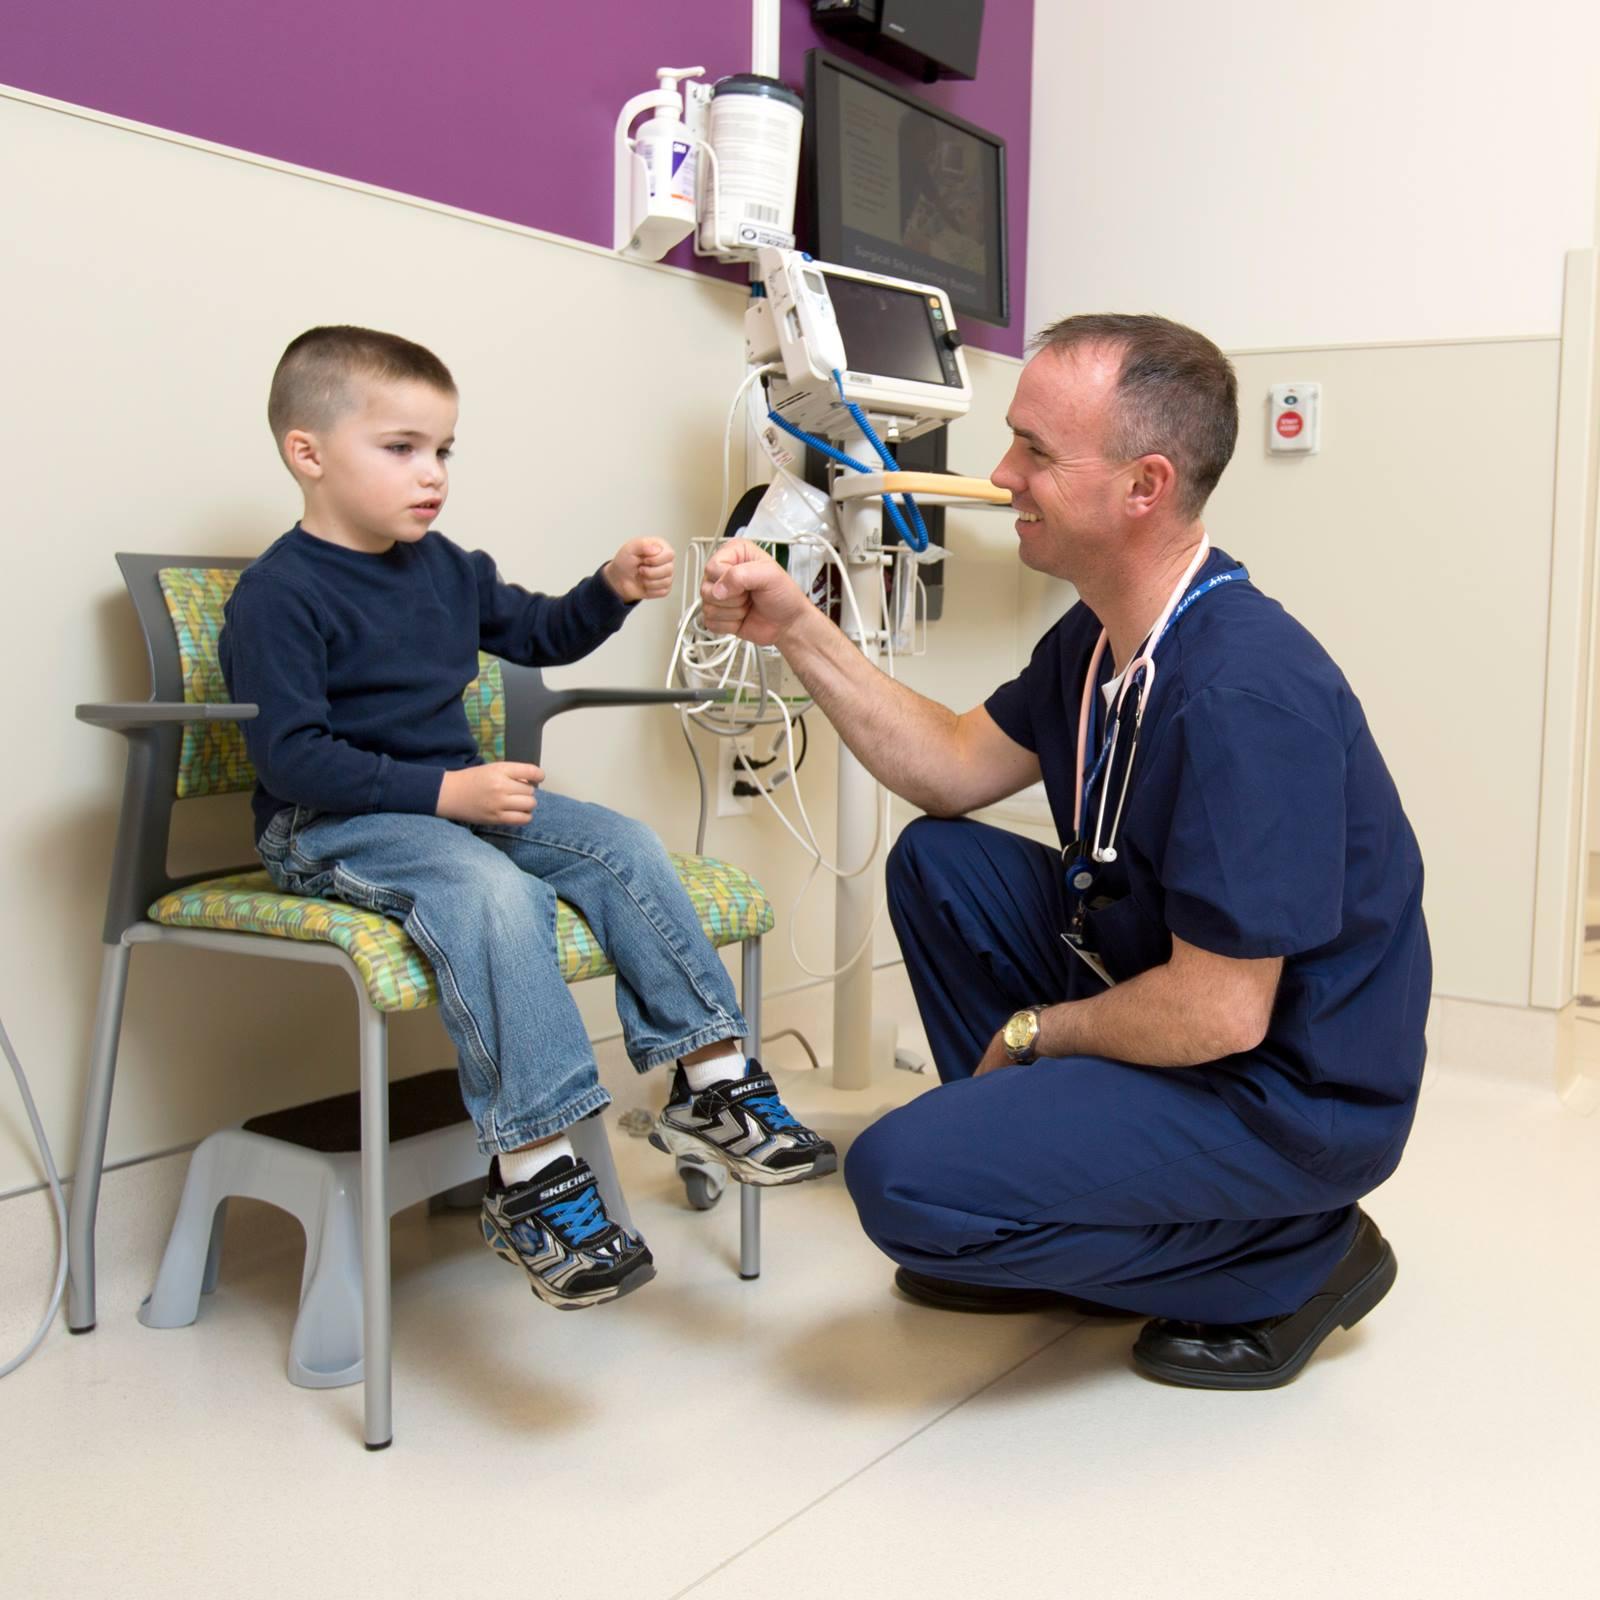 Children S: Primary Children's Hospital